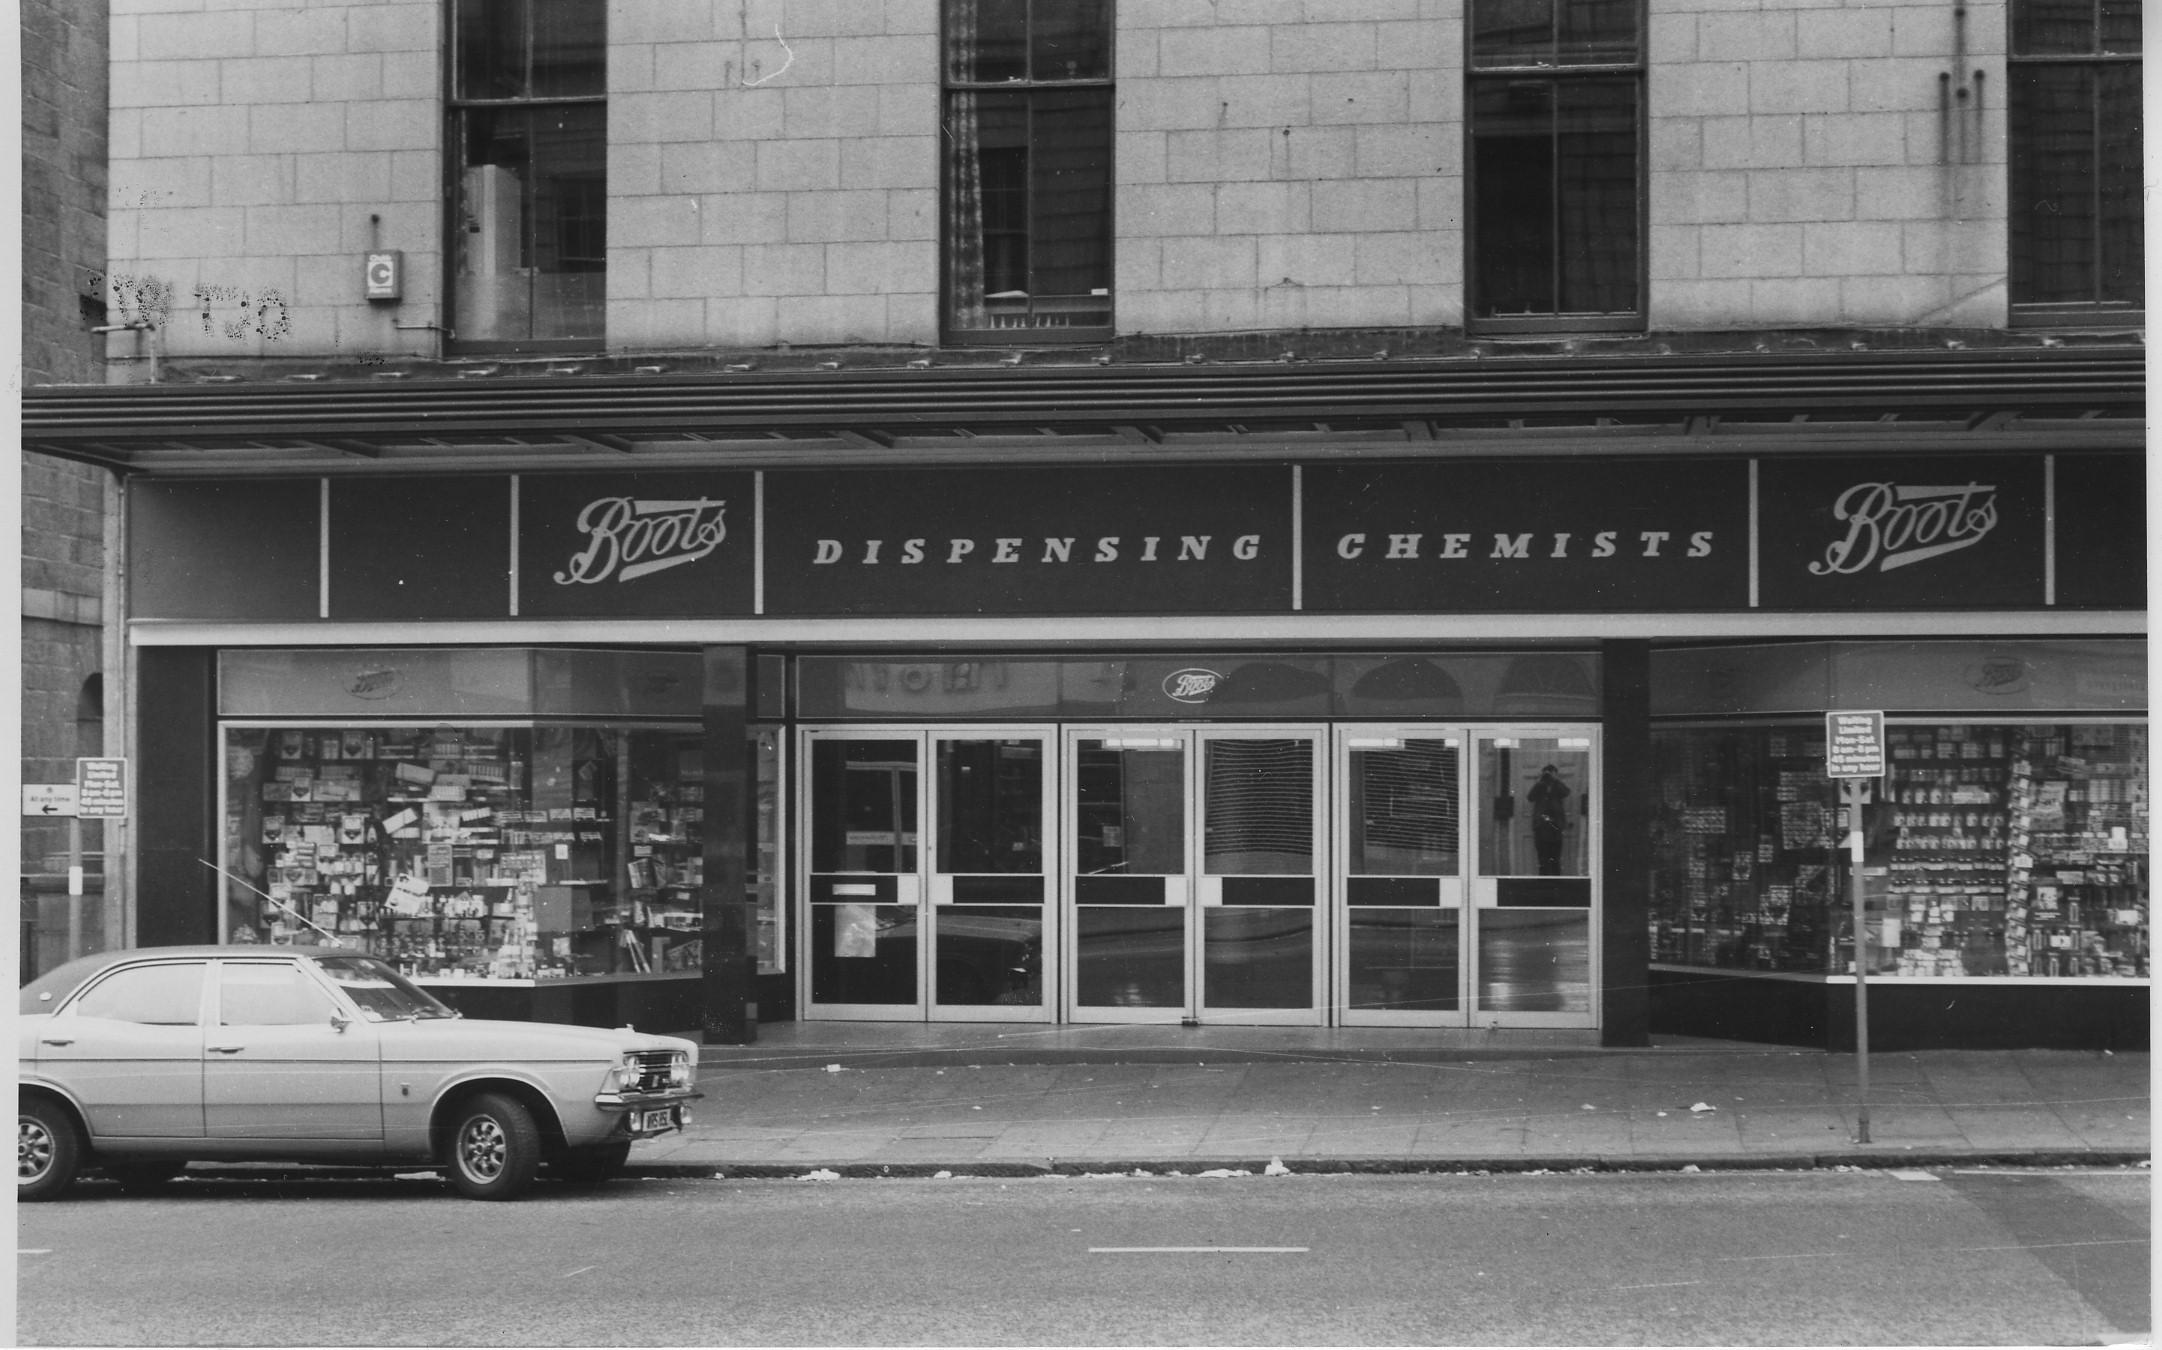 Boots, Union Street, 1973